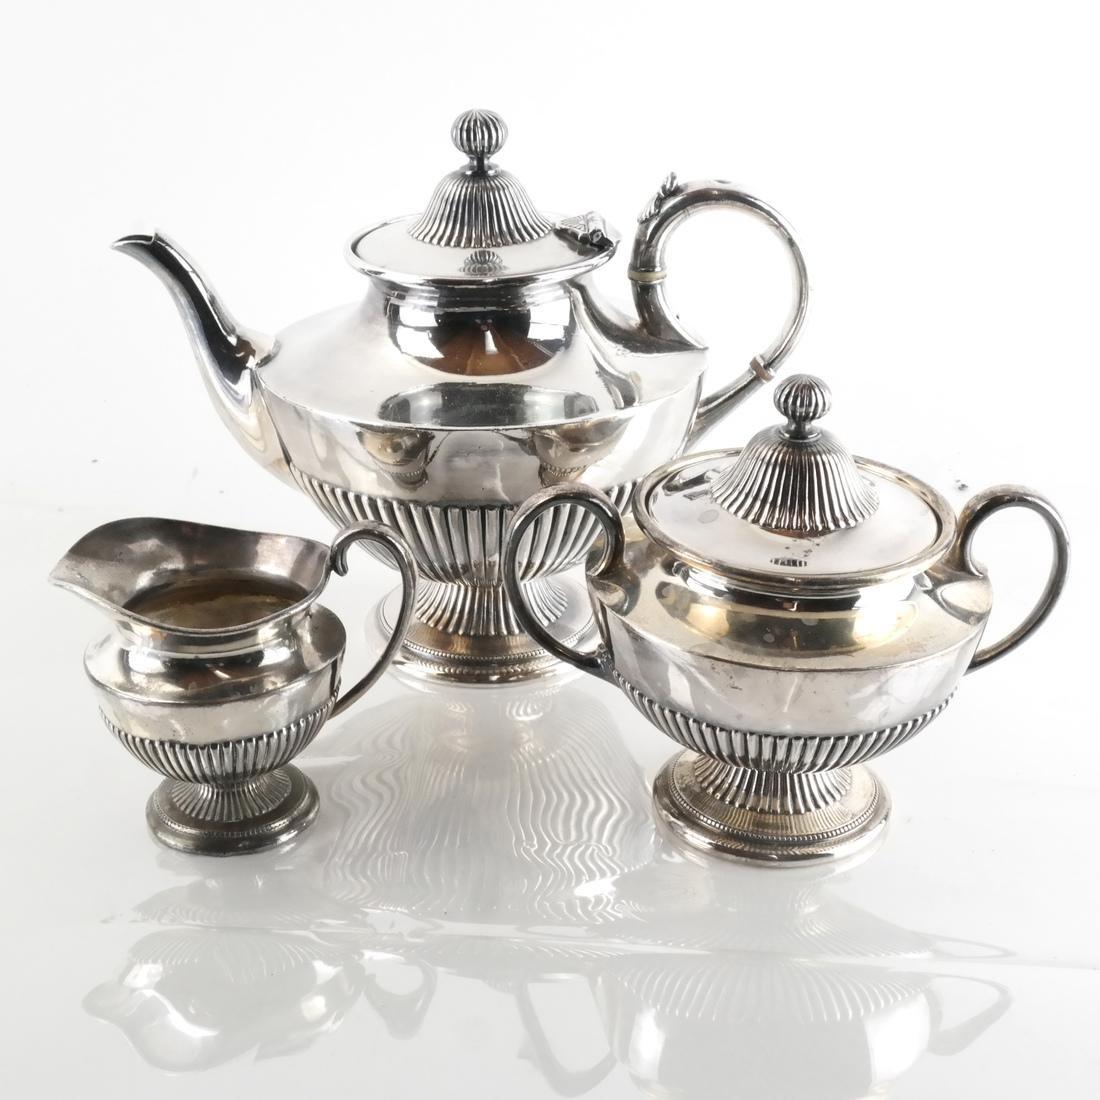 James Dixon & Sons, Silver Plate Tea Service